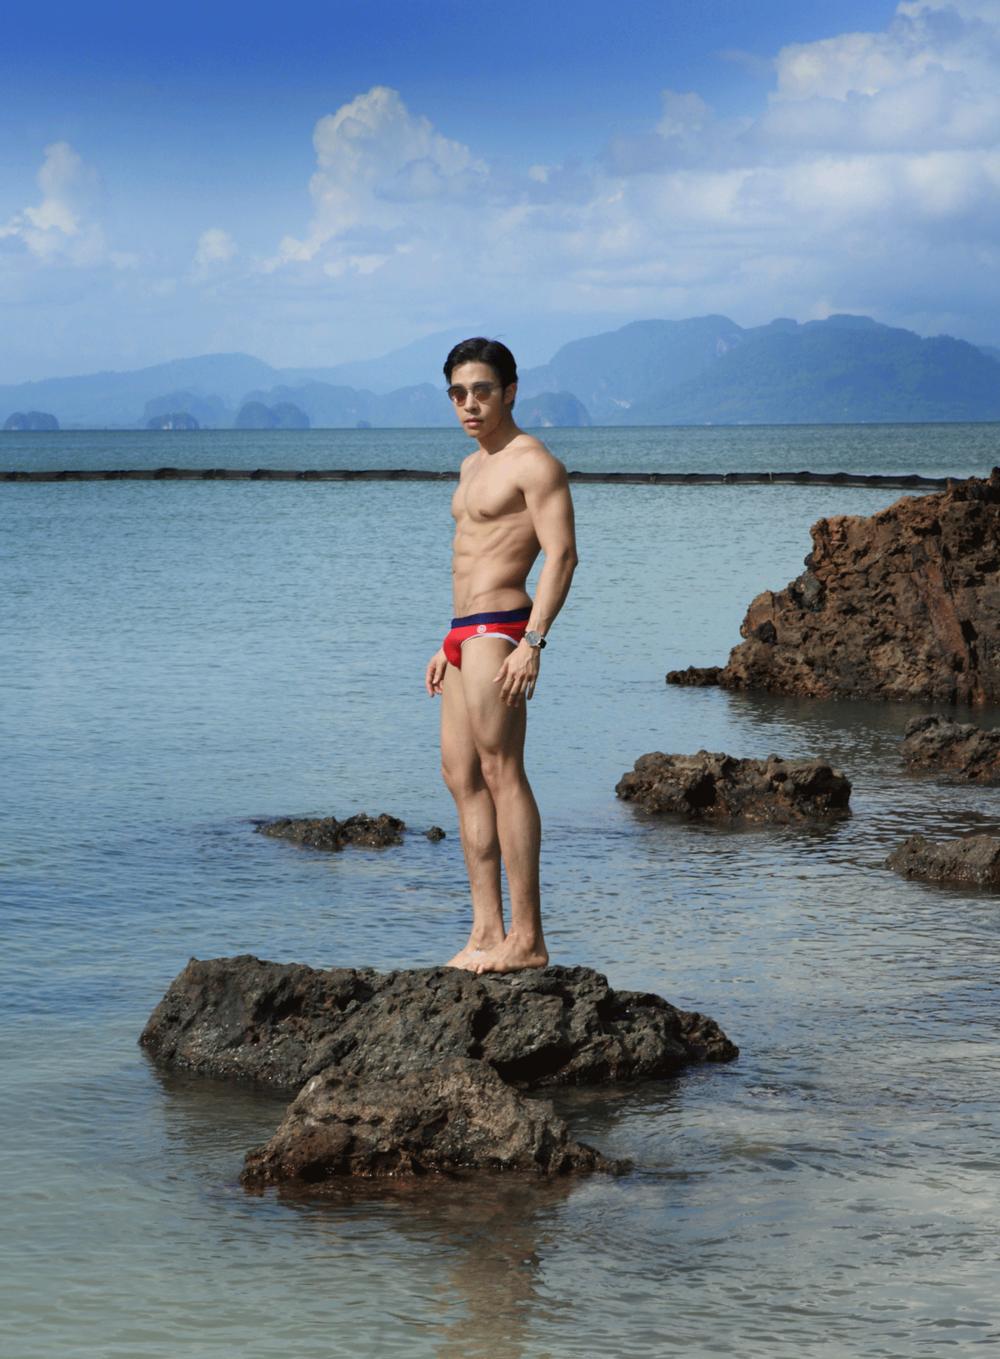 swimwear : NOXX / watch : FORREST / sunglasses : GLAZZIQ